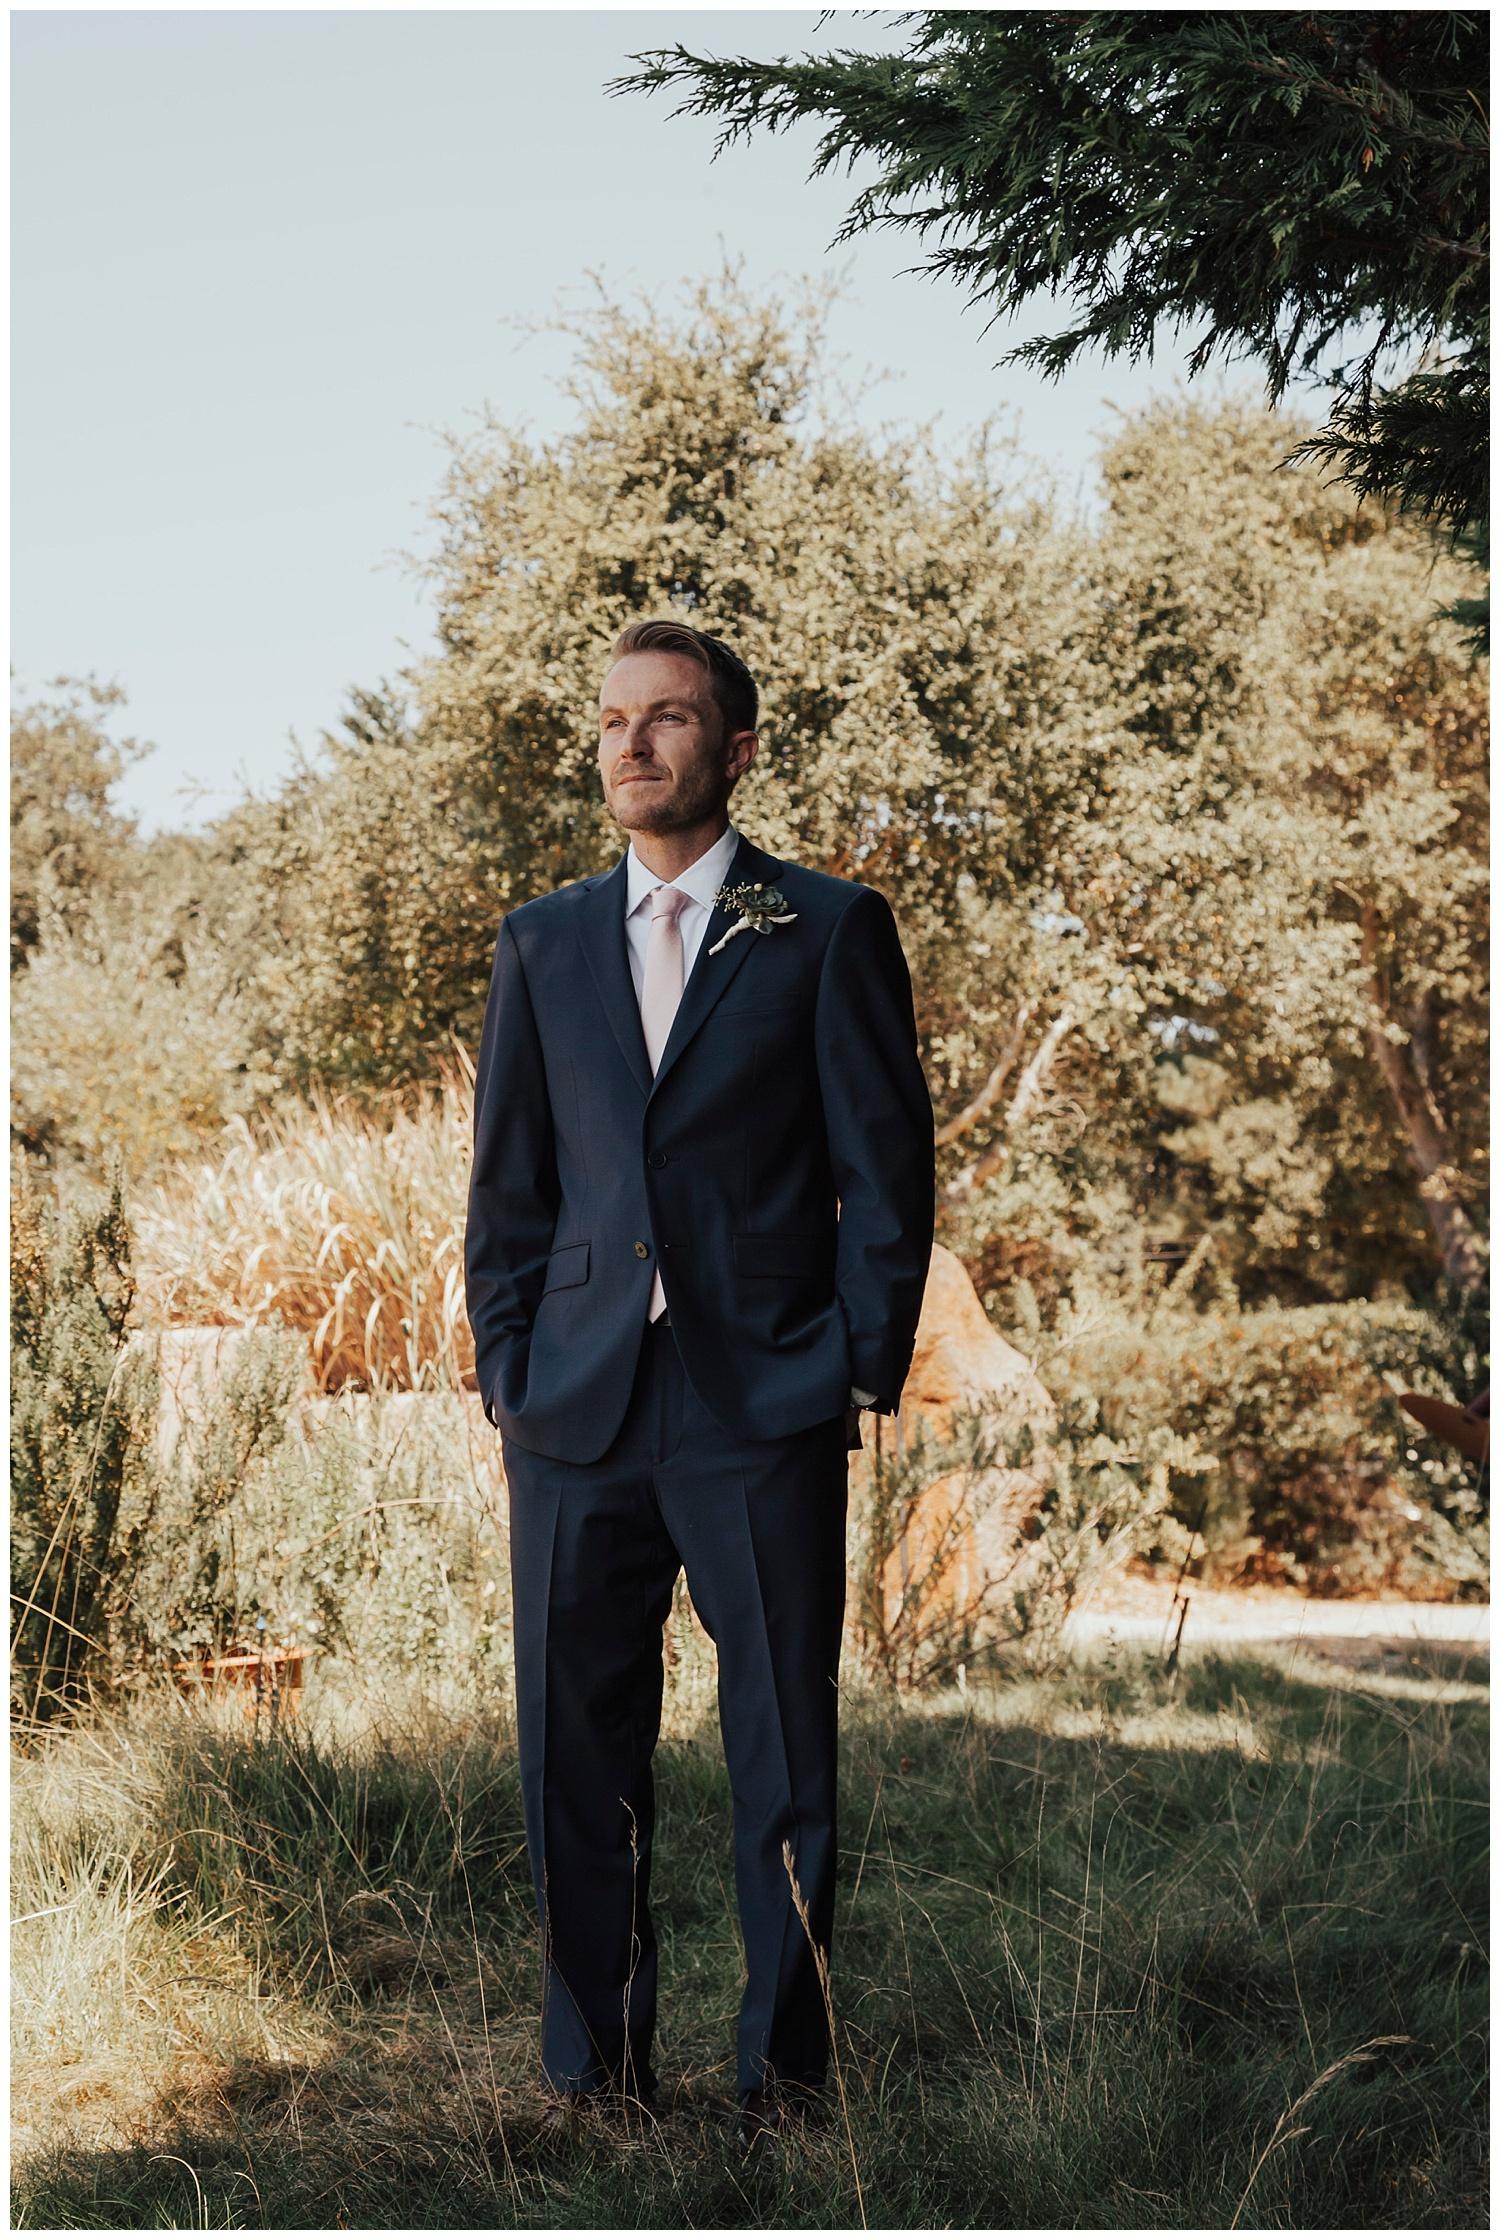 big-sur-wedding-groom-carol-oliva-photography.jpg